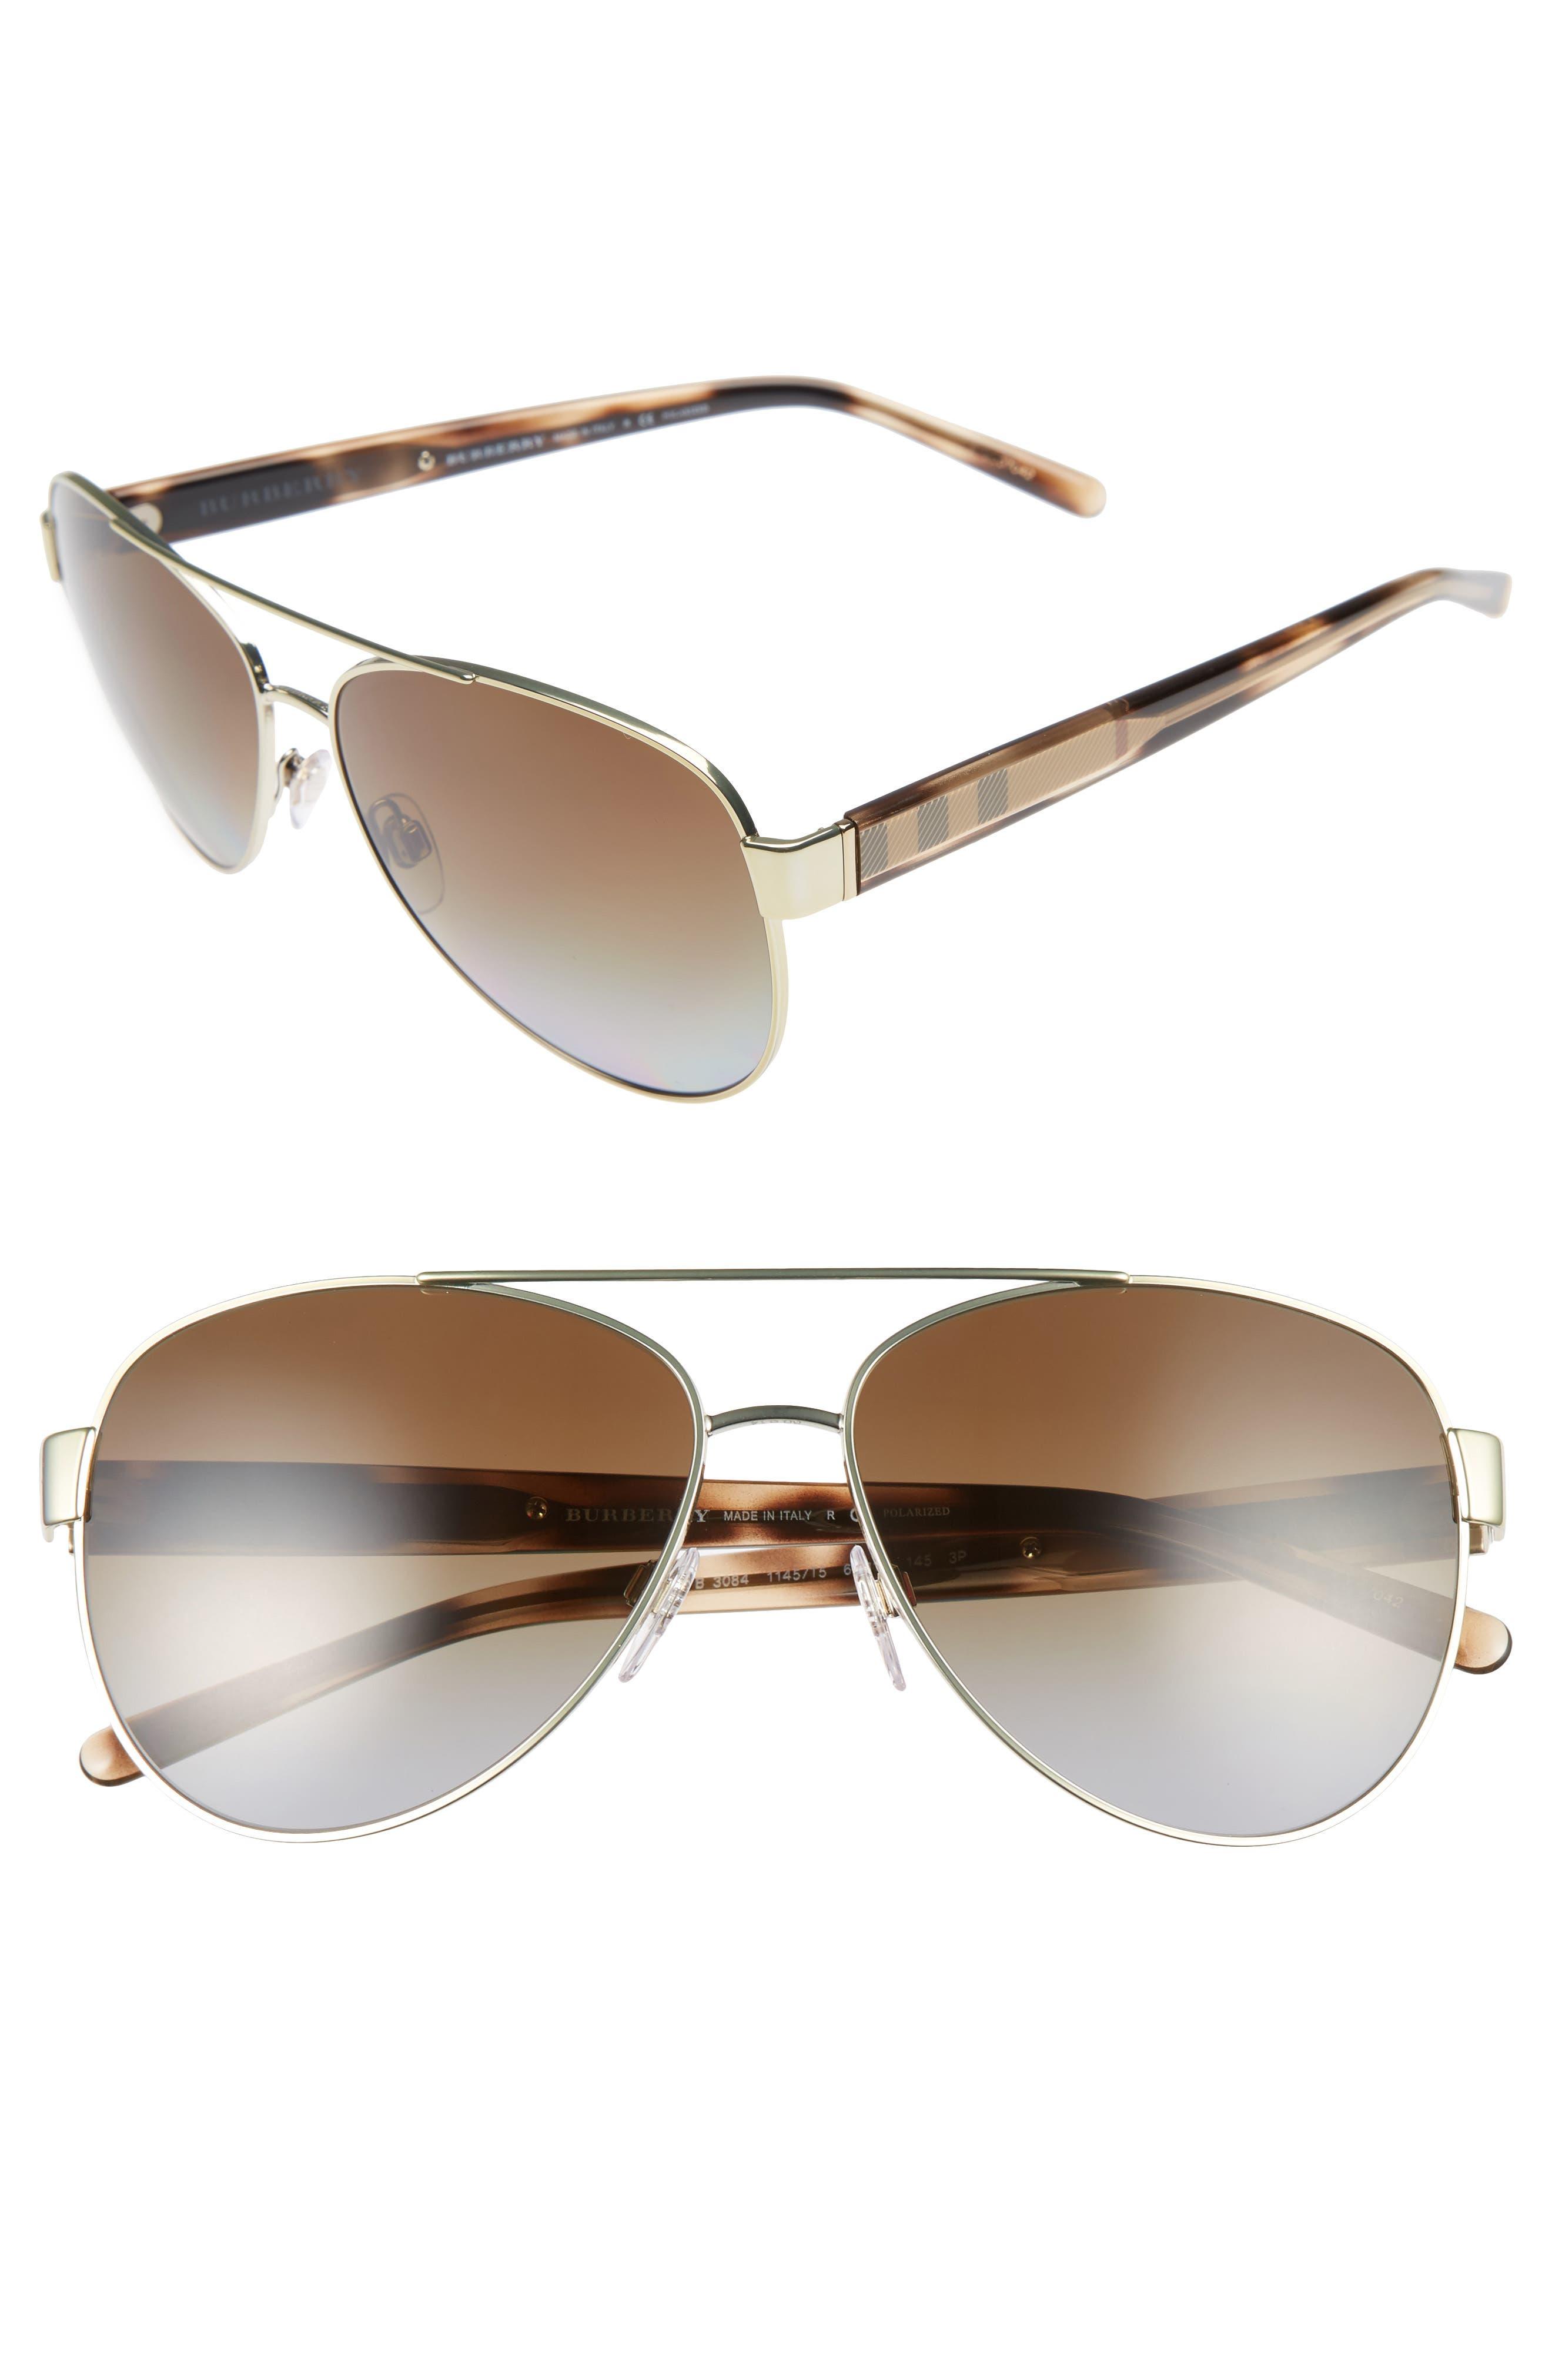 Burberry 60mm Polarized Aviator Sunglasses